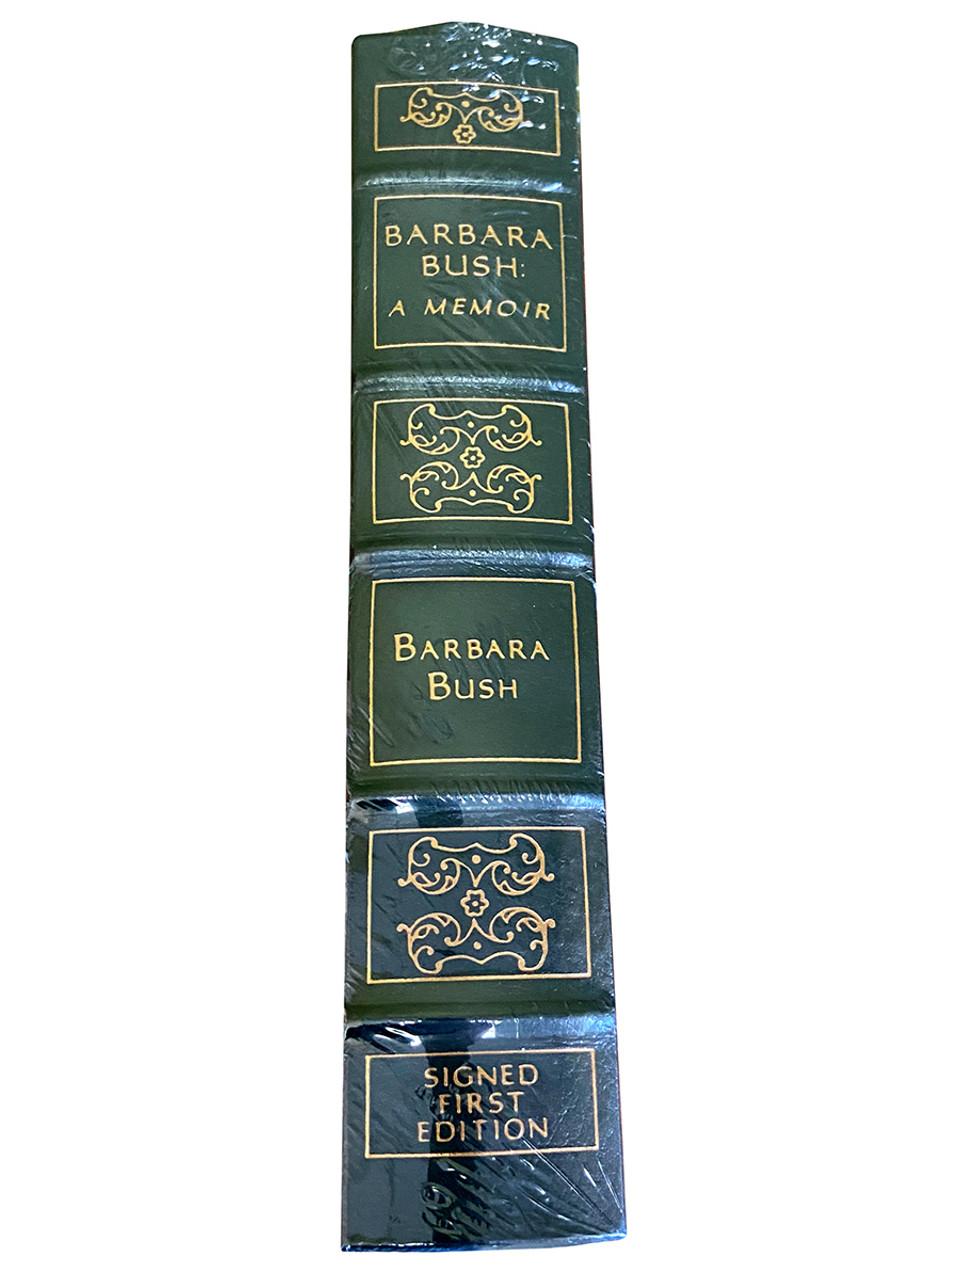 "Barbara Bush ""BARBARA BUSH: A MEMOIR"" Signed First Edition, Leather Bound Collector's Edition [Sealed]"